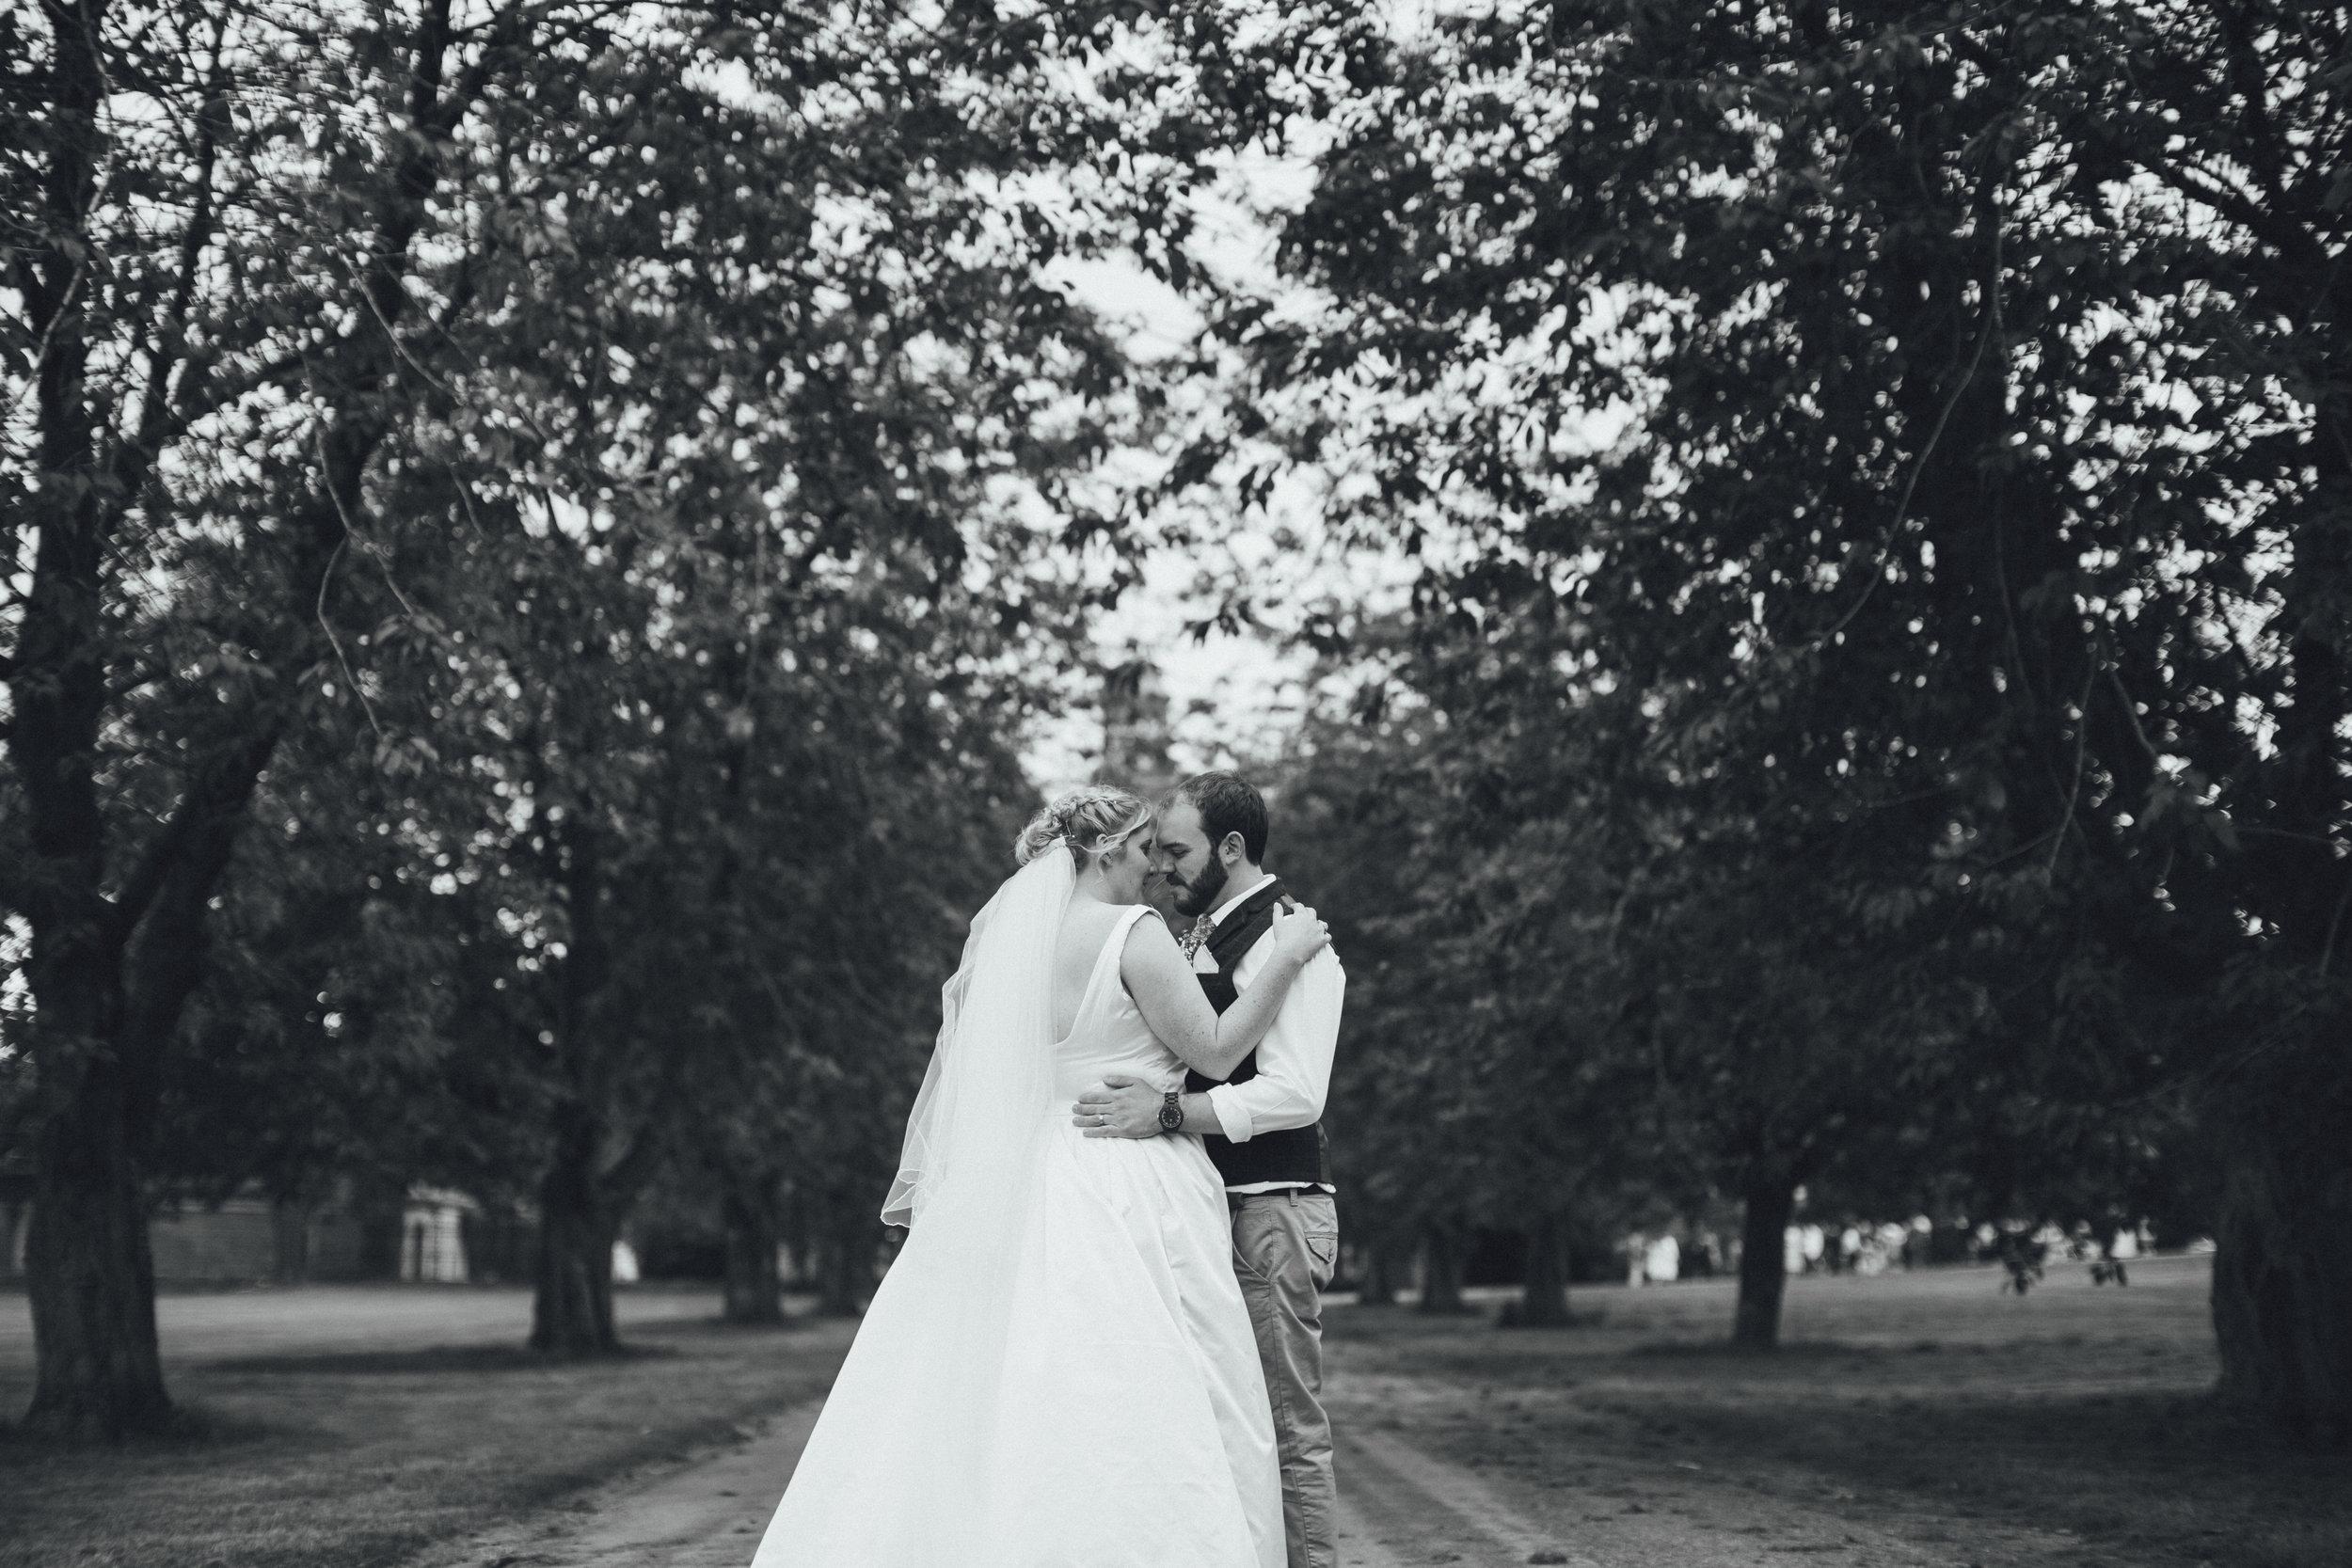 thoresby courtyard, wedding photographers in nottinghamshire2.jpg